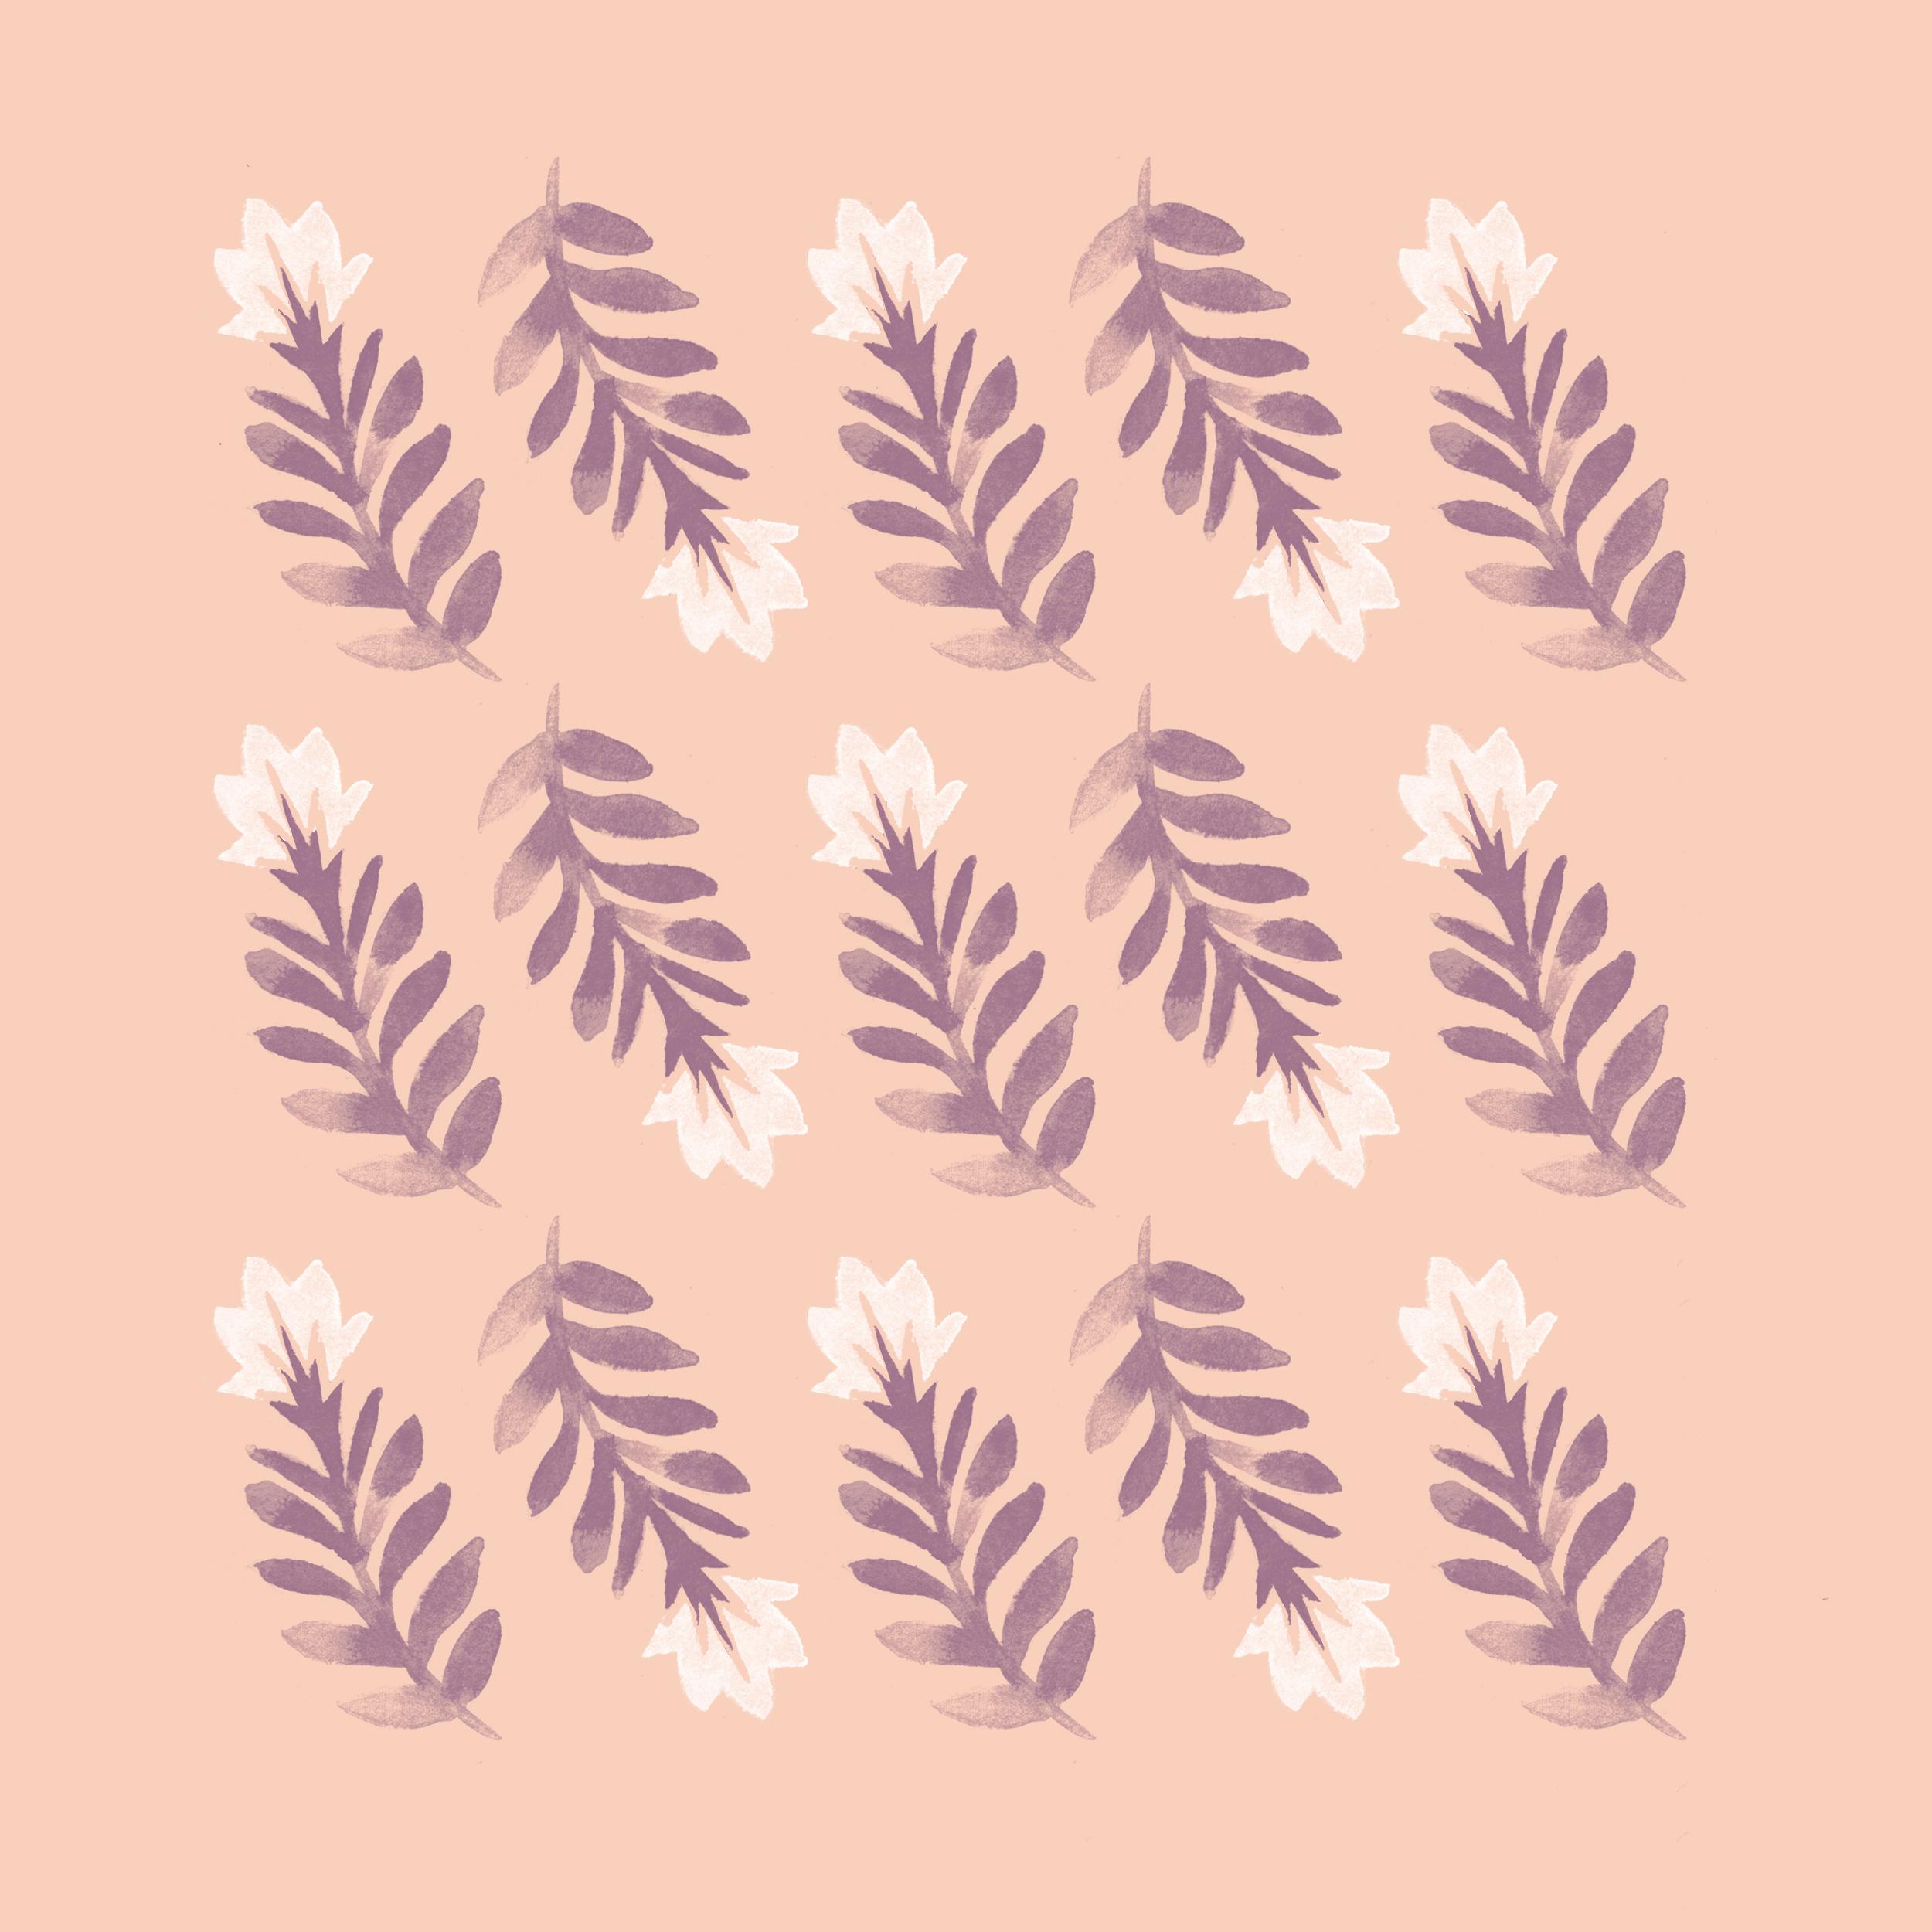 patternexperimentsII